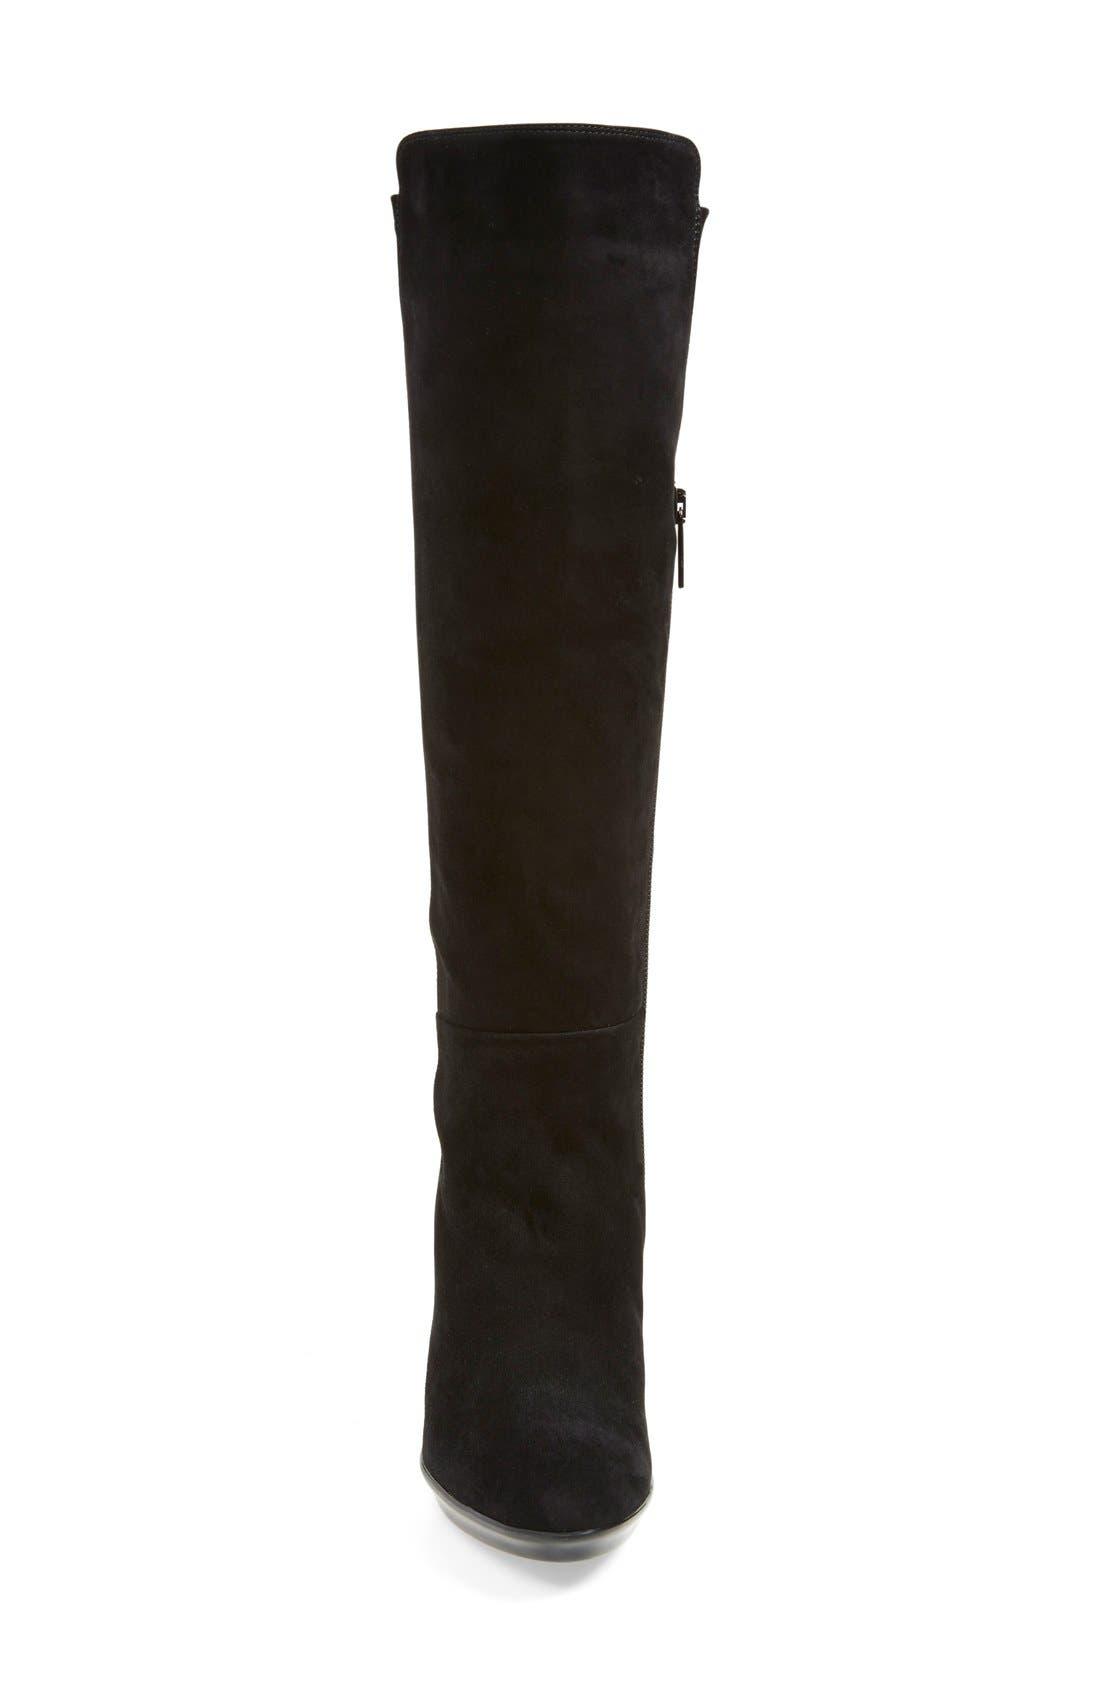 Alternate Image 3  - Aquatalia 'Raine' Weatherproof Tall Boot (Women)